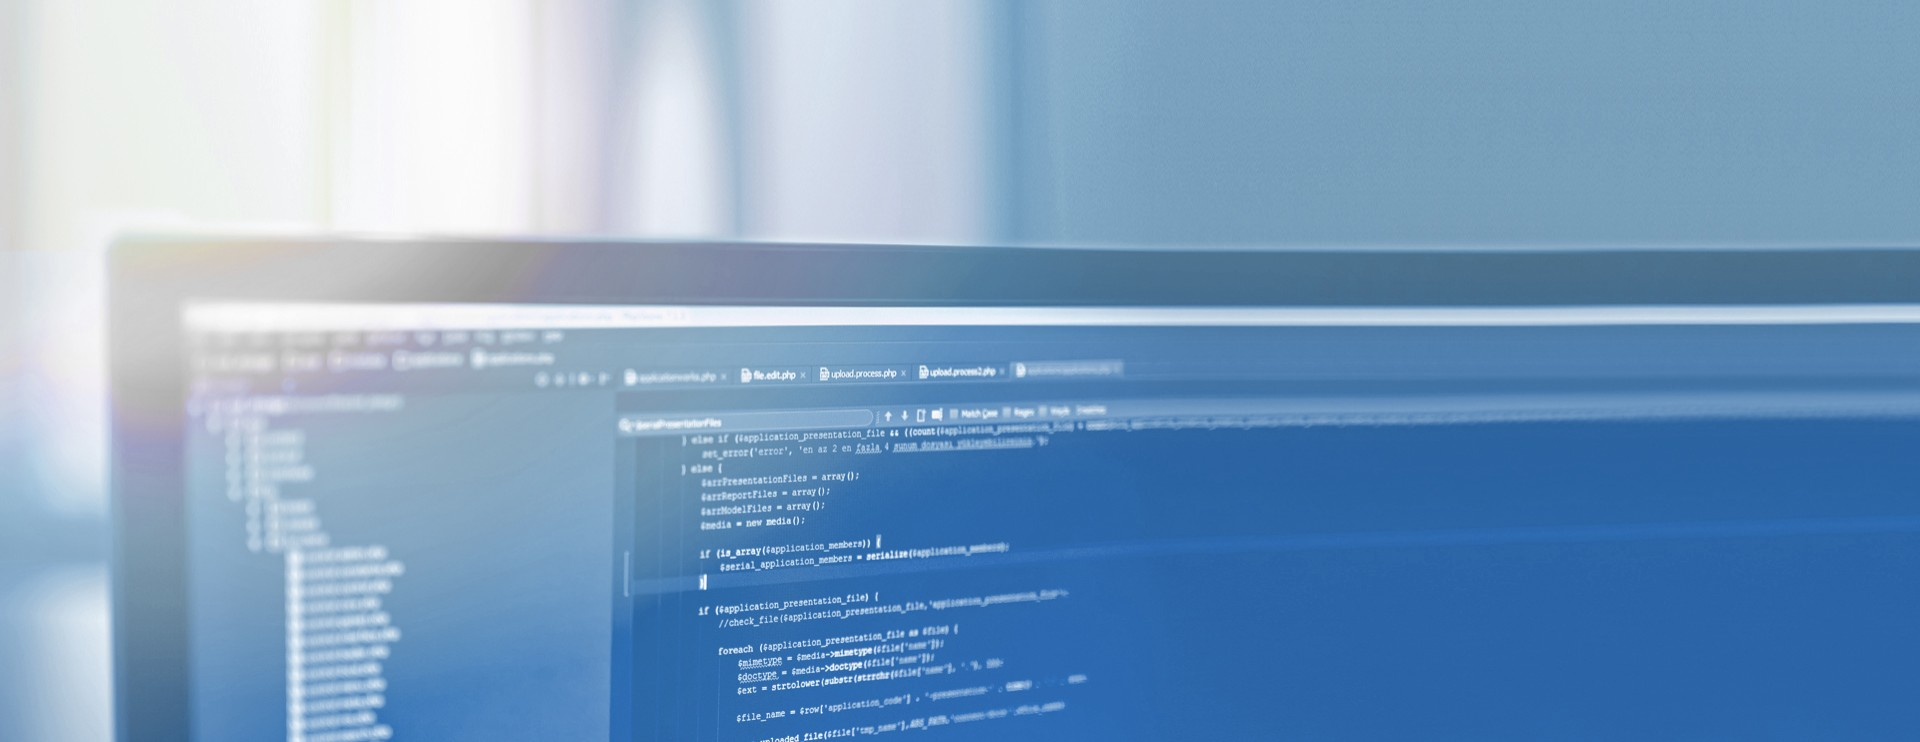 Close-up of the upper part of a blue desktop